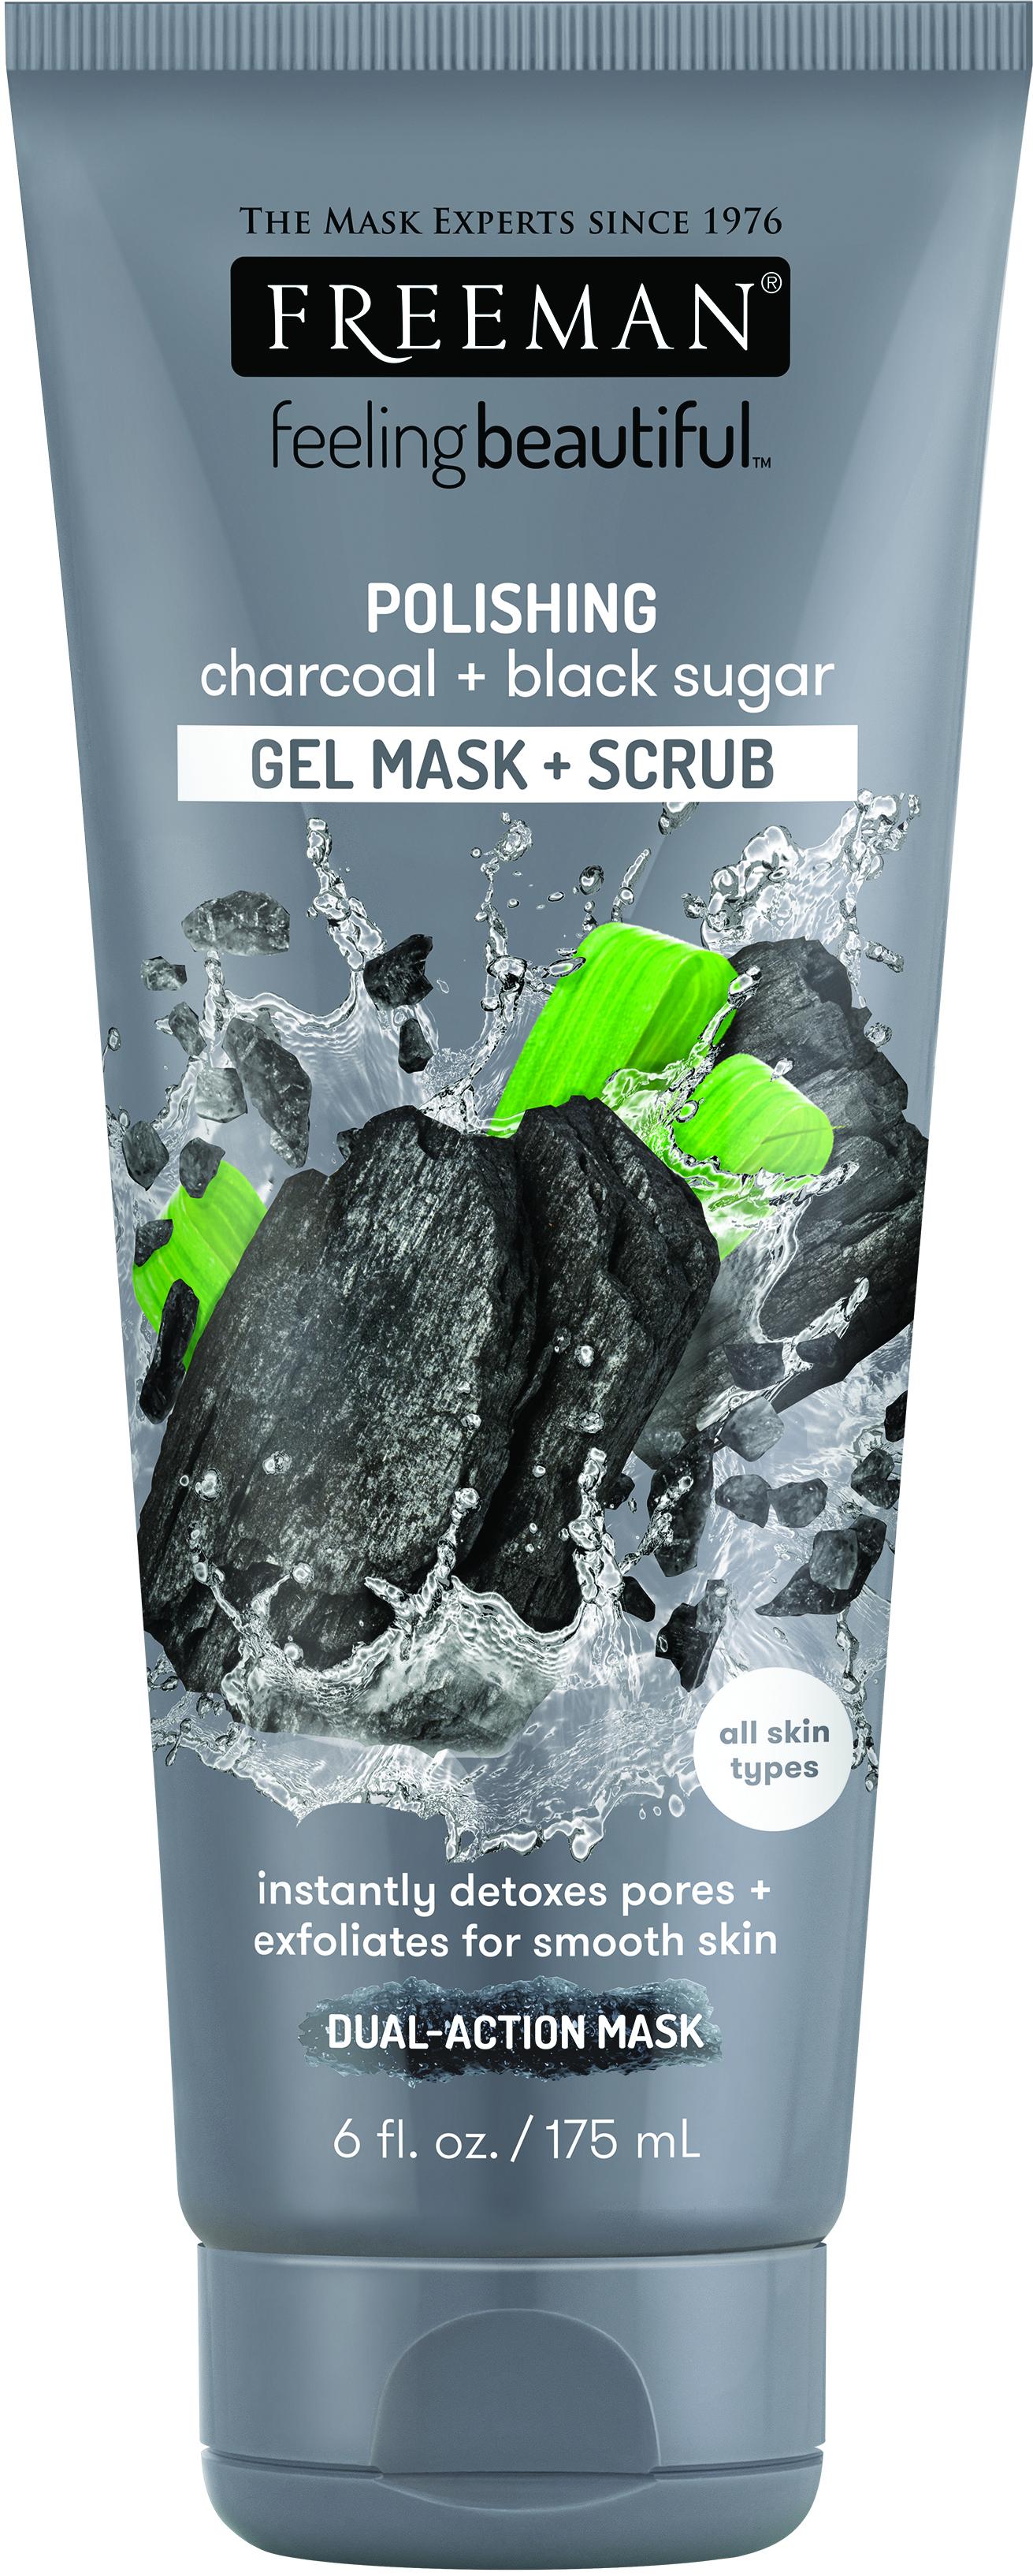 Freeman Feeling Beautiful™ Polishing Charcoal & Black Sugar Gel Mask + Scrub